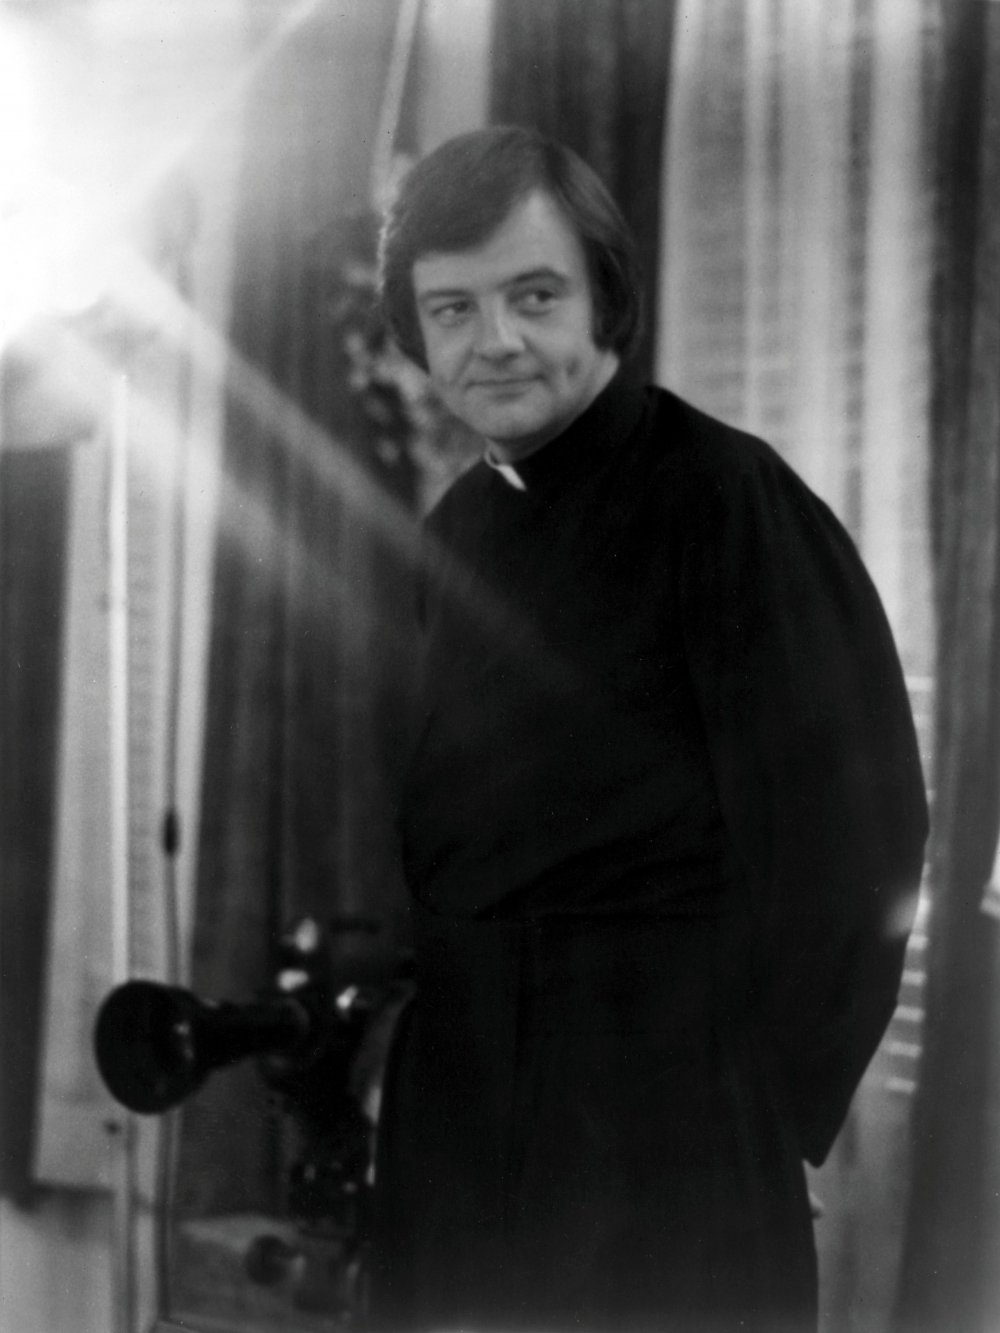 George A Romero shooting Martin (1976)